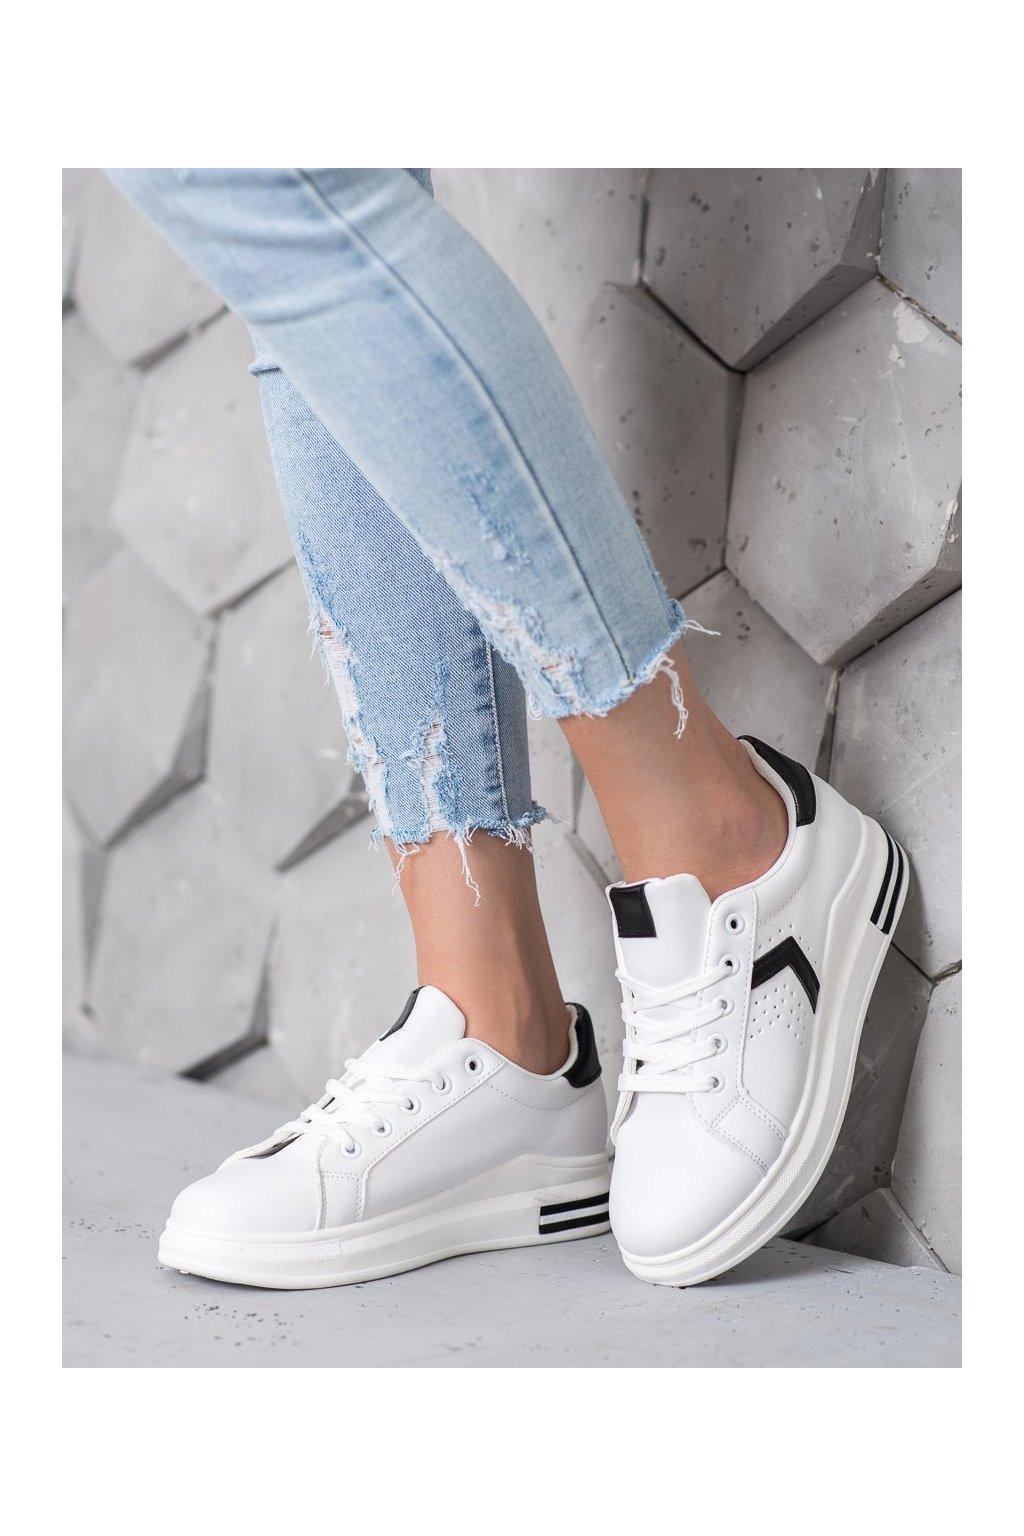 Biele tenisky Shelovet kod R14YD4799-1B